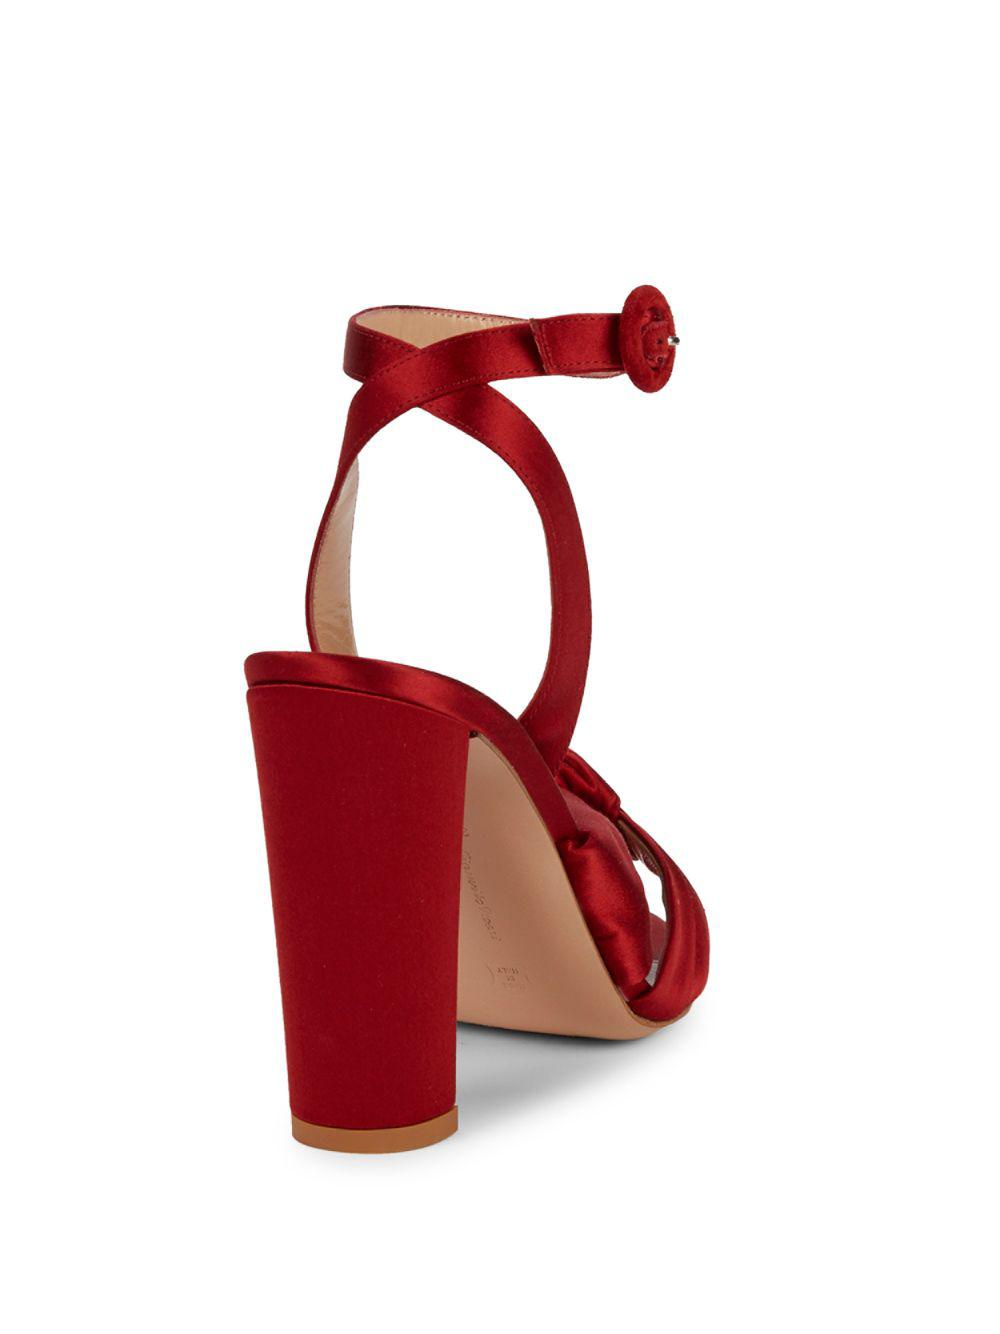 c1e6296f1f5d Lyst - Gianvito Rossi Satin Knot Block Heel Sandals in Red